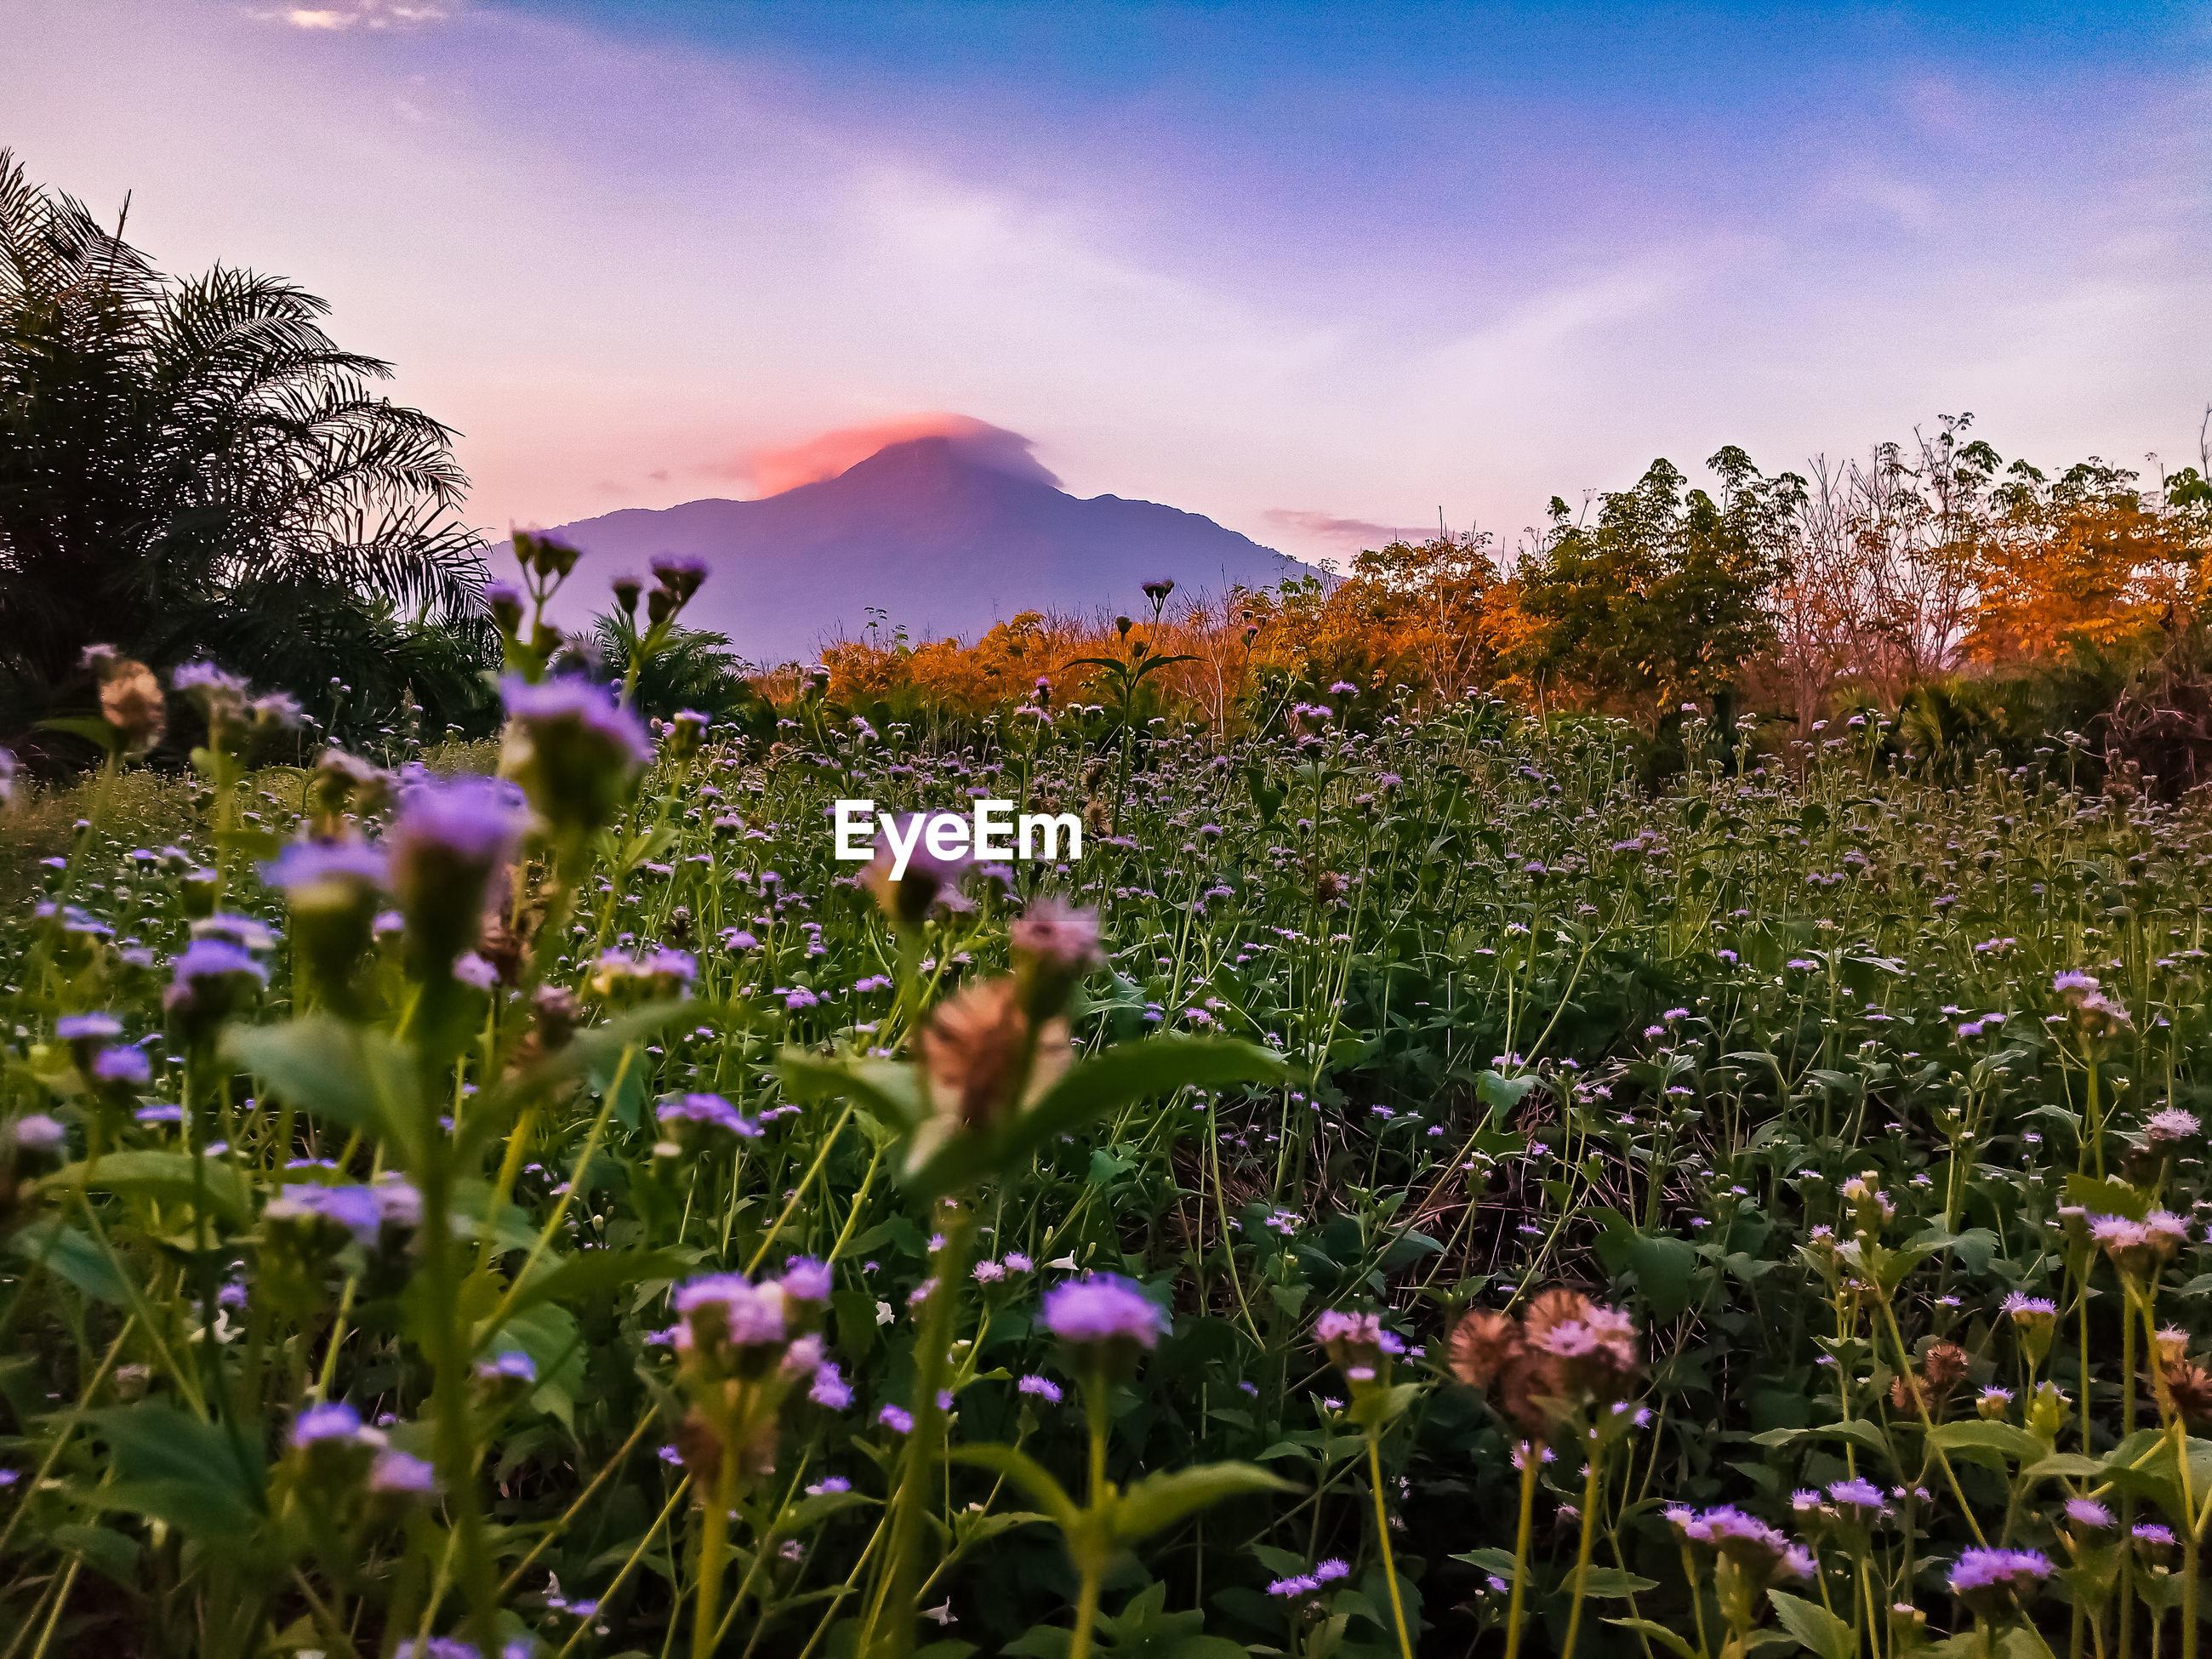 PURPLE FLOWERING PLANT ON FIELD AGAINST SKY